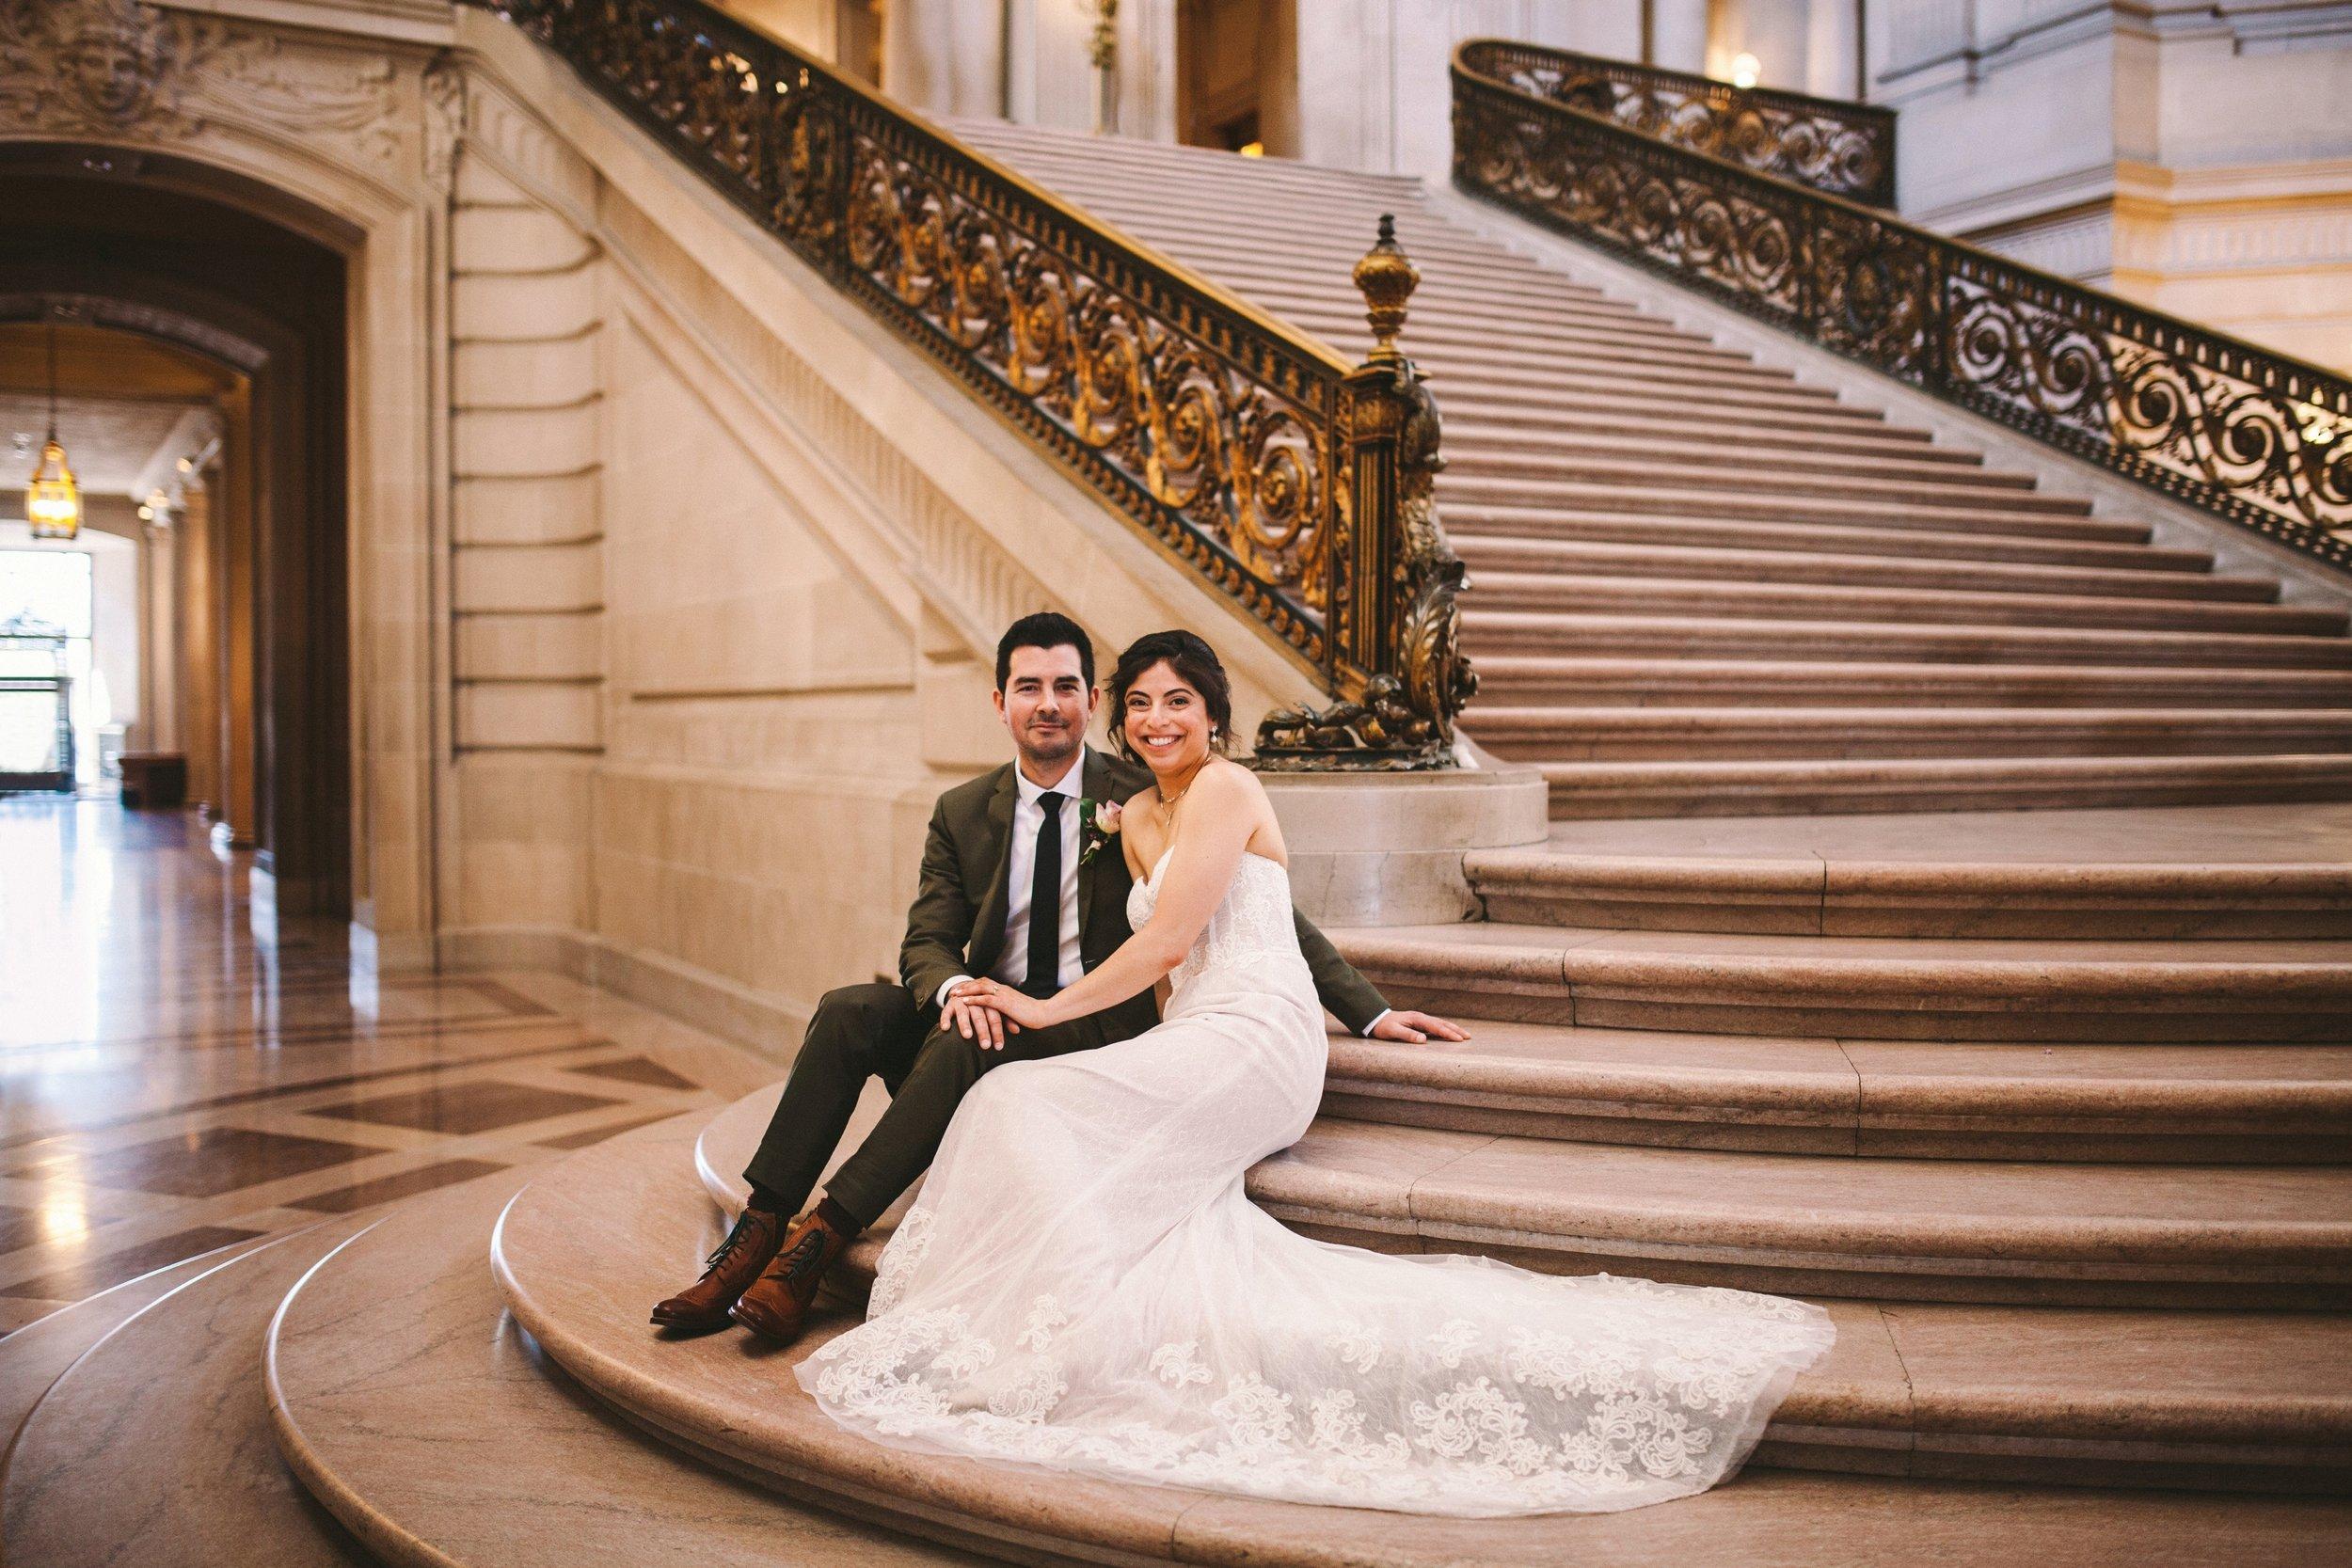 San Francisco City Hall & Stable Cafe Wedding Photography 304.jpg